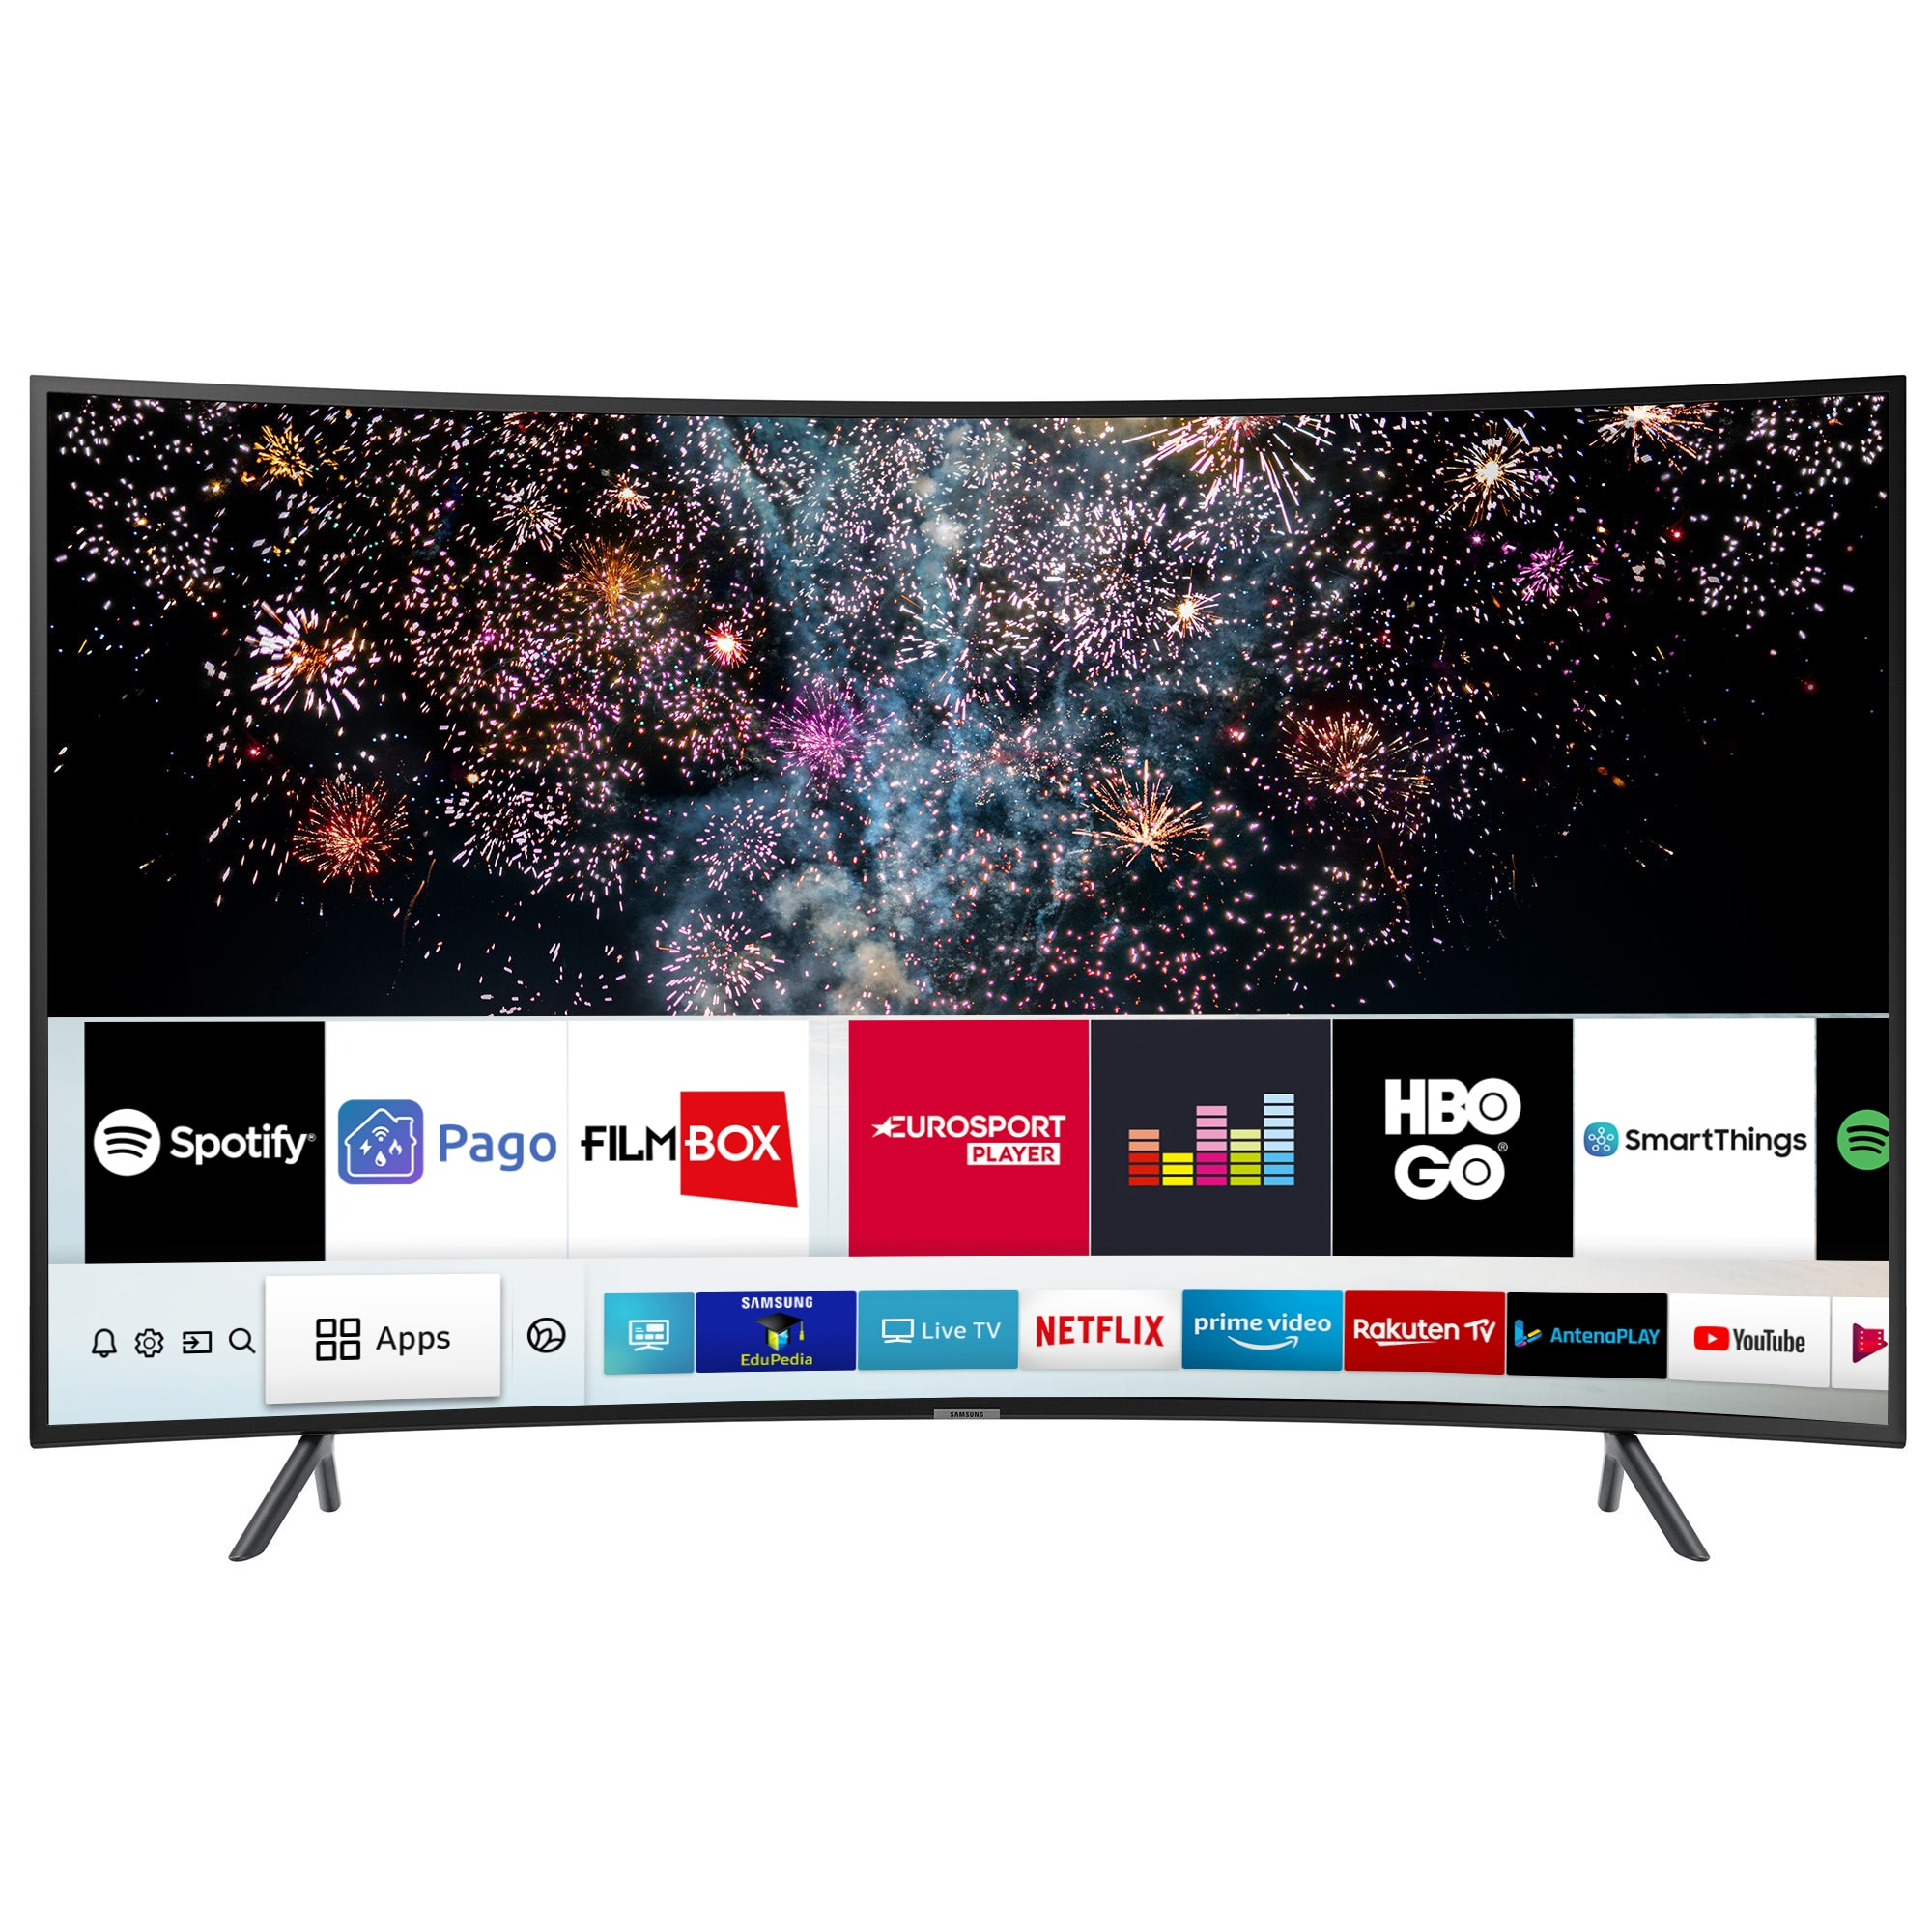 Fotografie Televizor LED Curbat Smart Samsung, 138 cm, 55RU7372, 4K Ultra HD